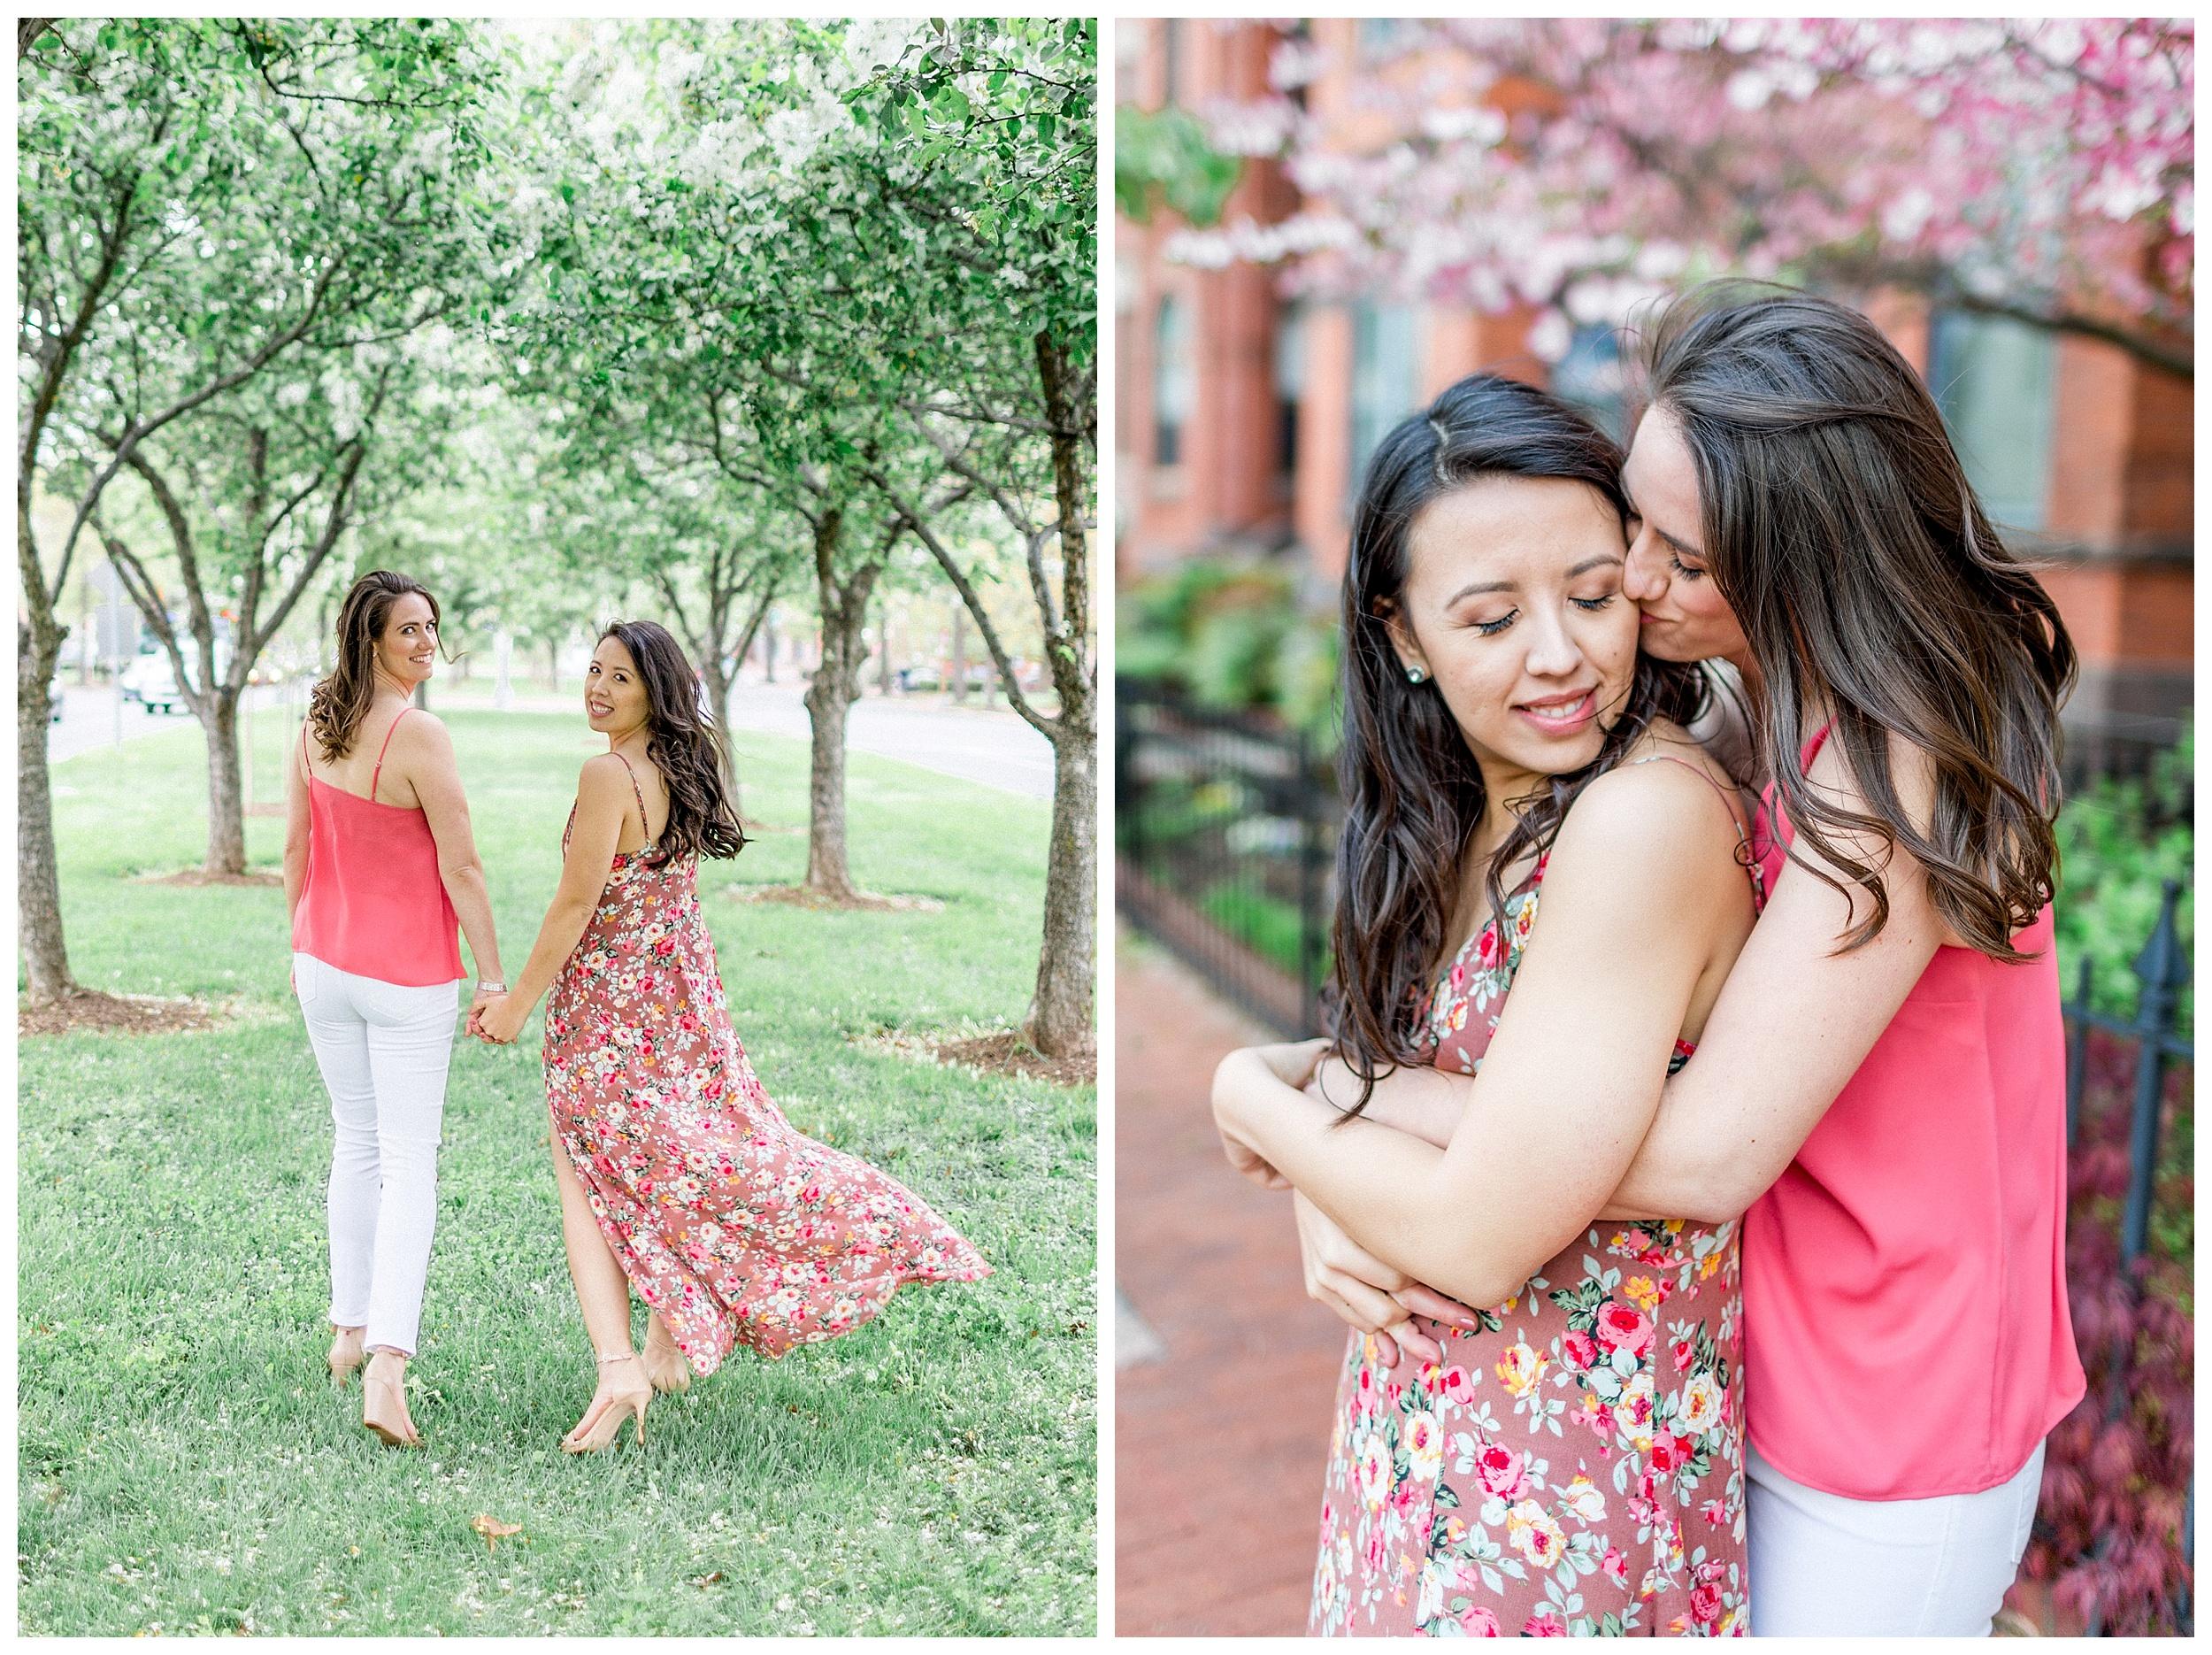 Same Sex DC Engagement | District of Columbia Wedding Photographer Kir Tuben_0012.jpg